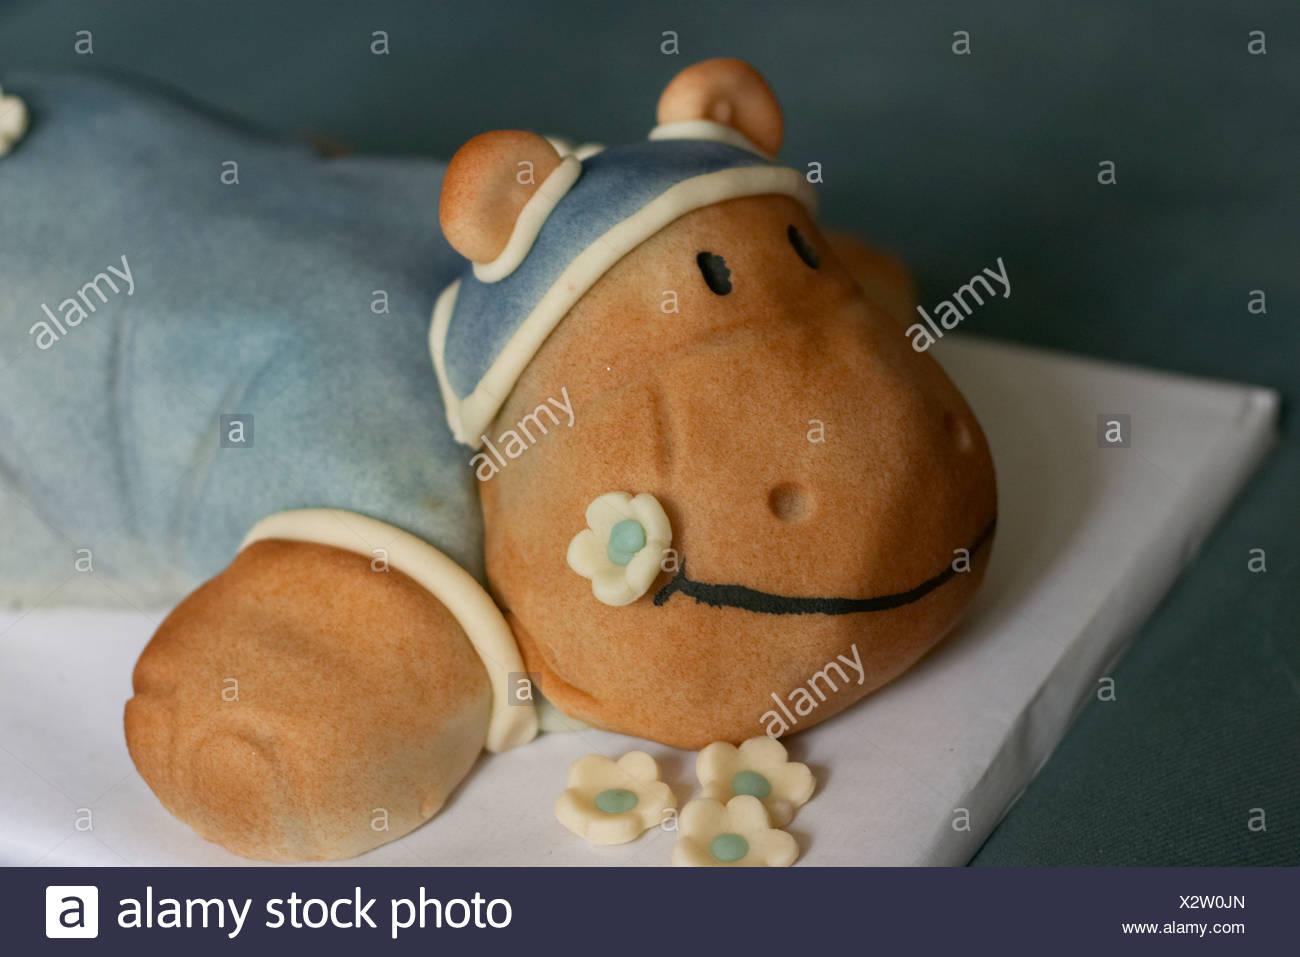 Marvelous Hippo Birthday Cake Stock Photo 277144525 Alamy Personalised Birthday Cards Akebfashionlily Jamesorg